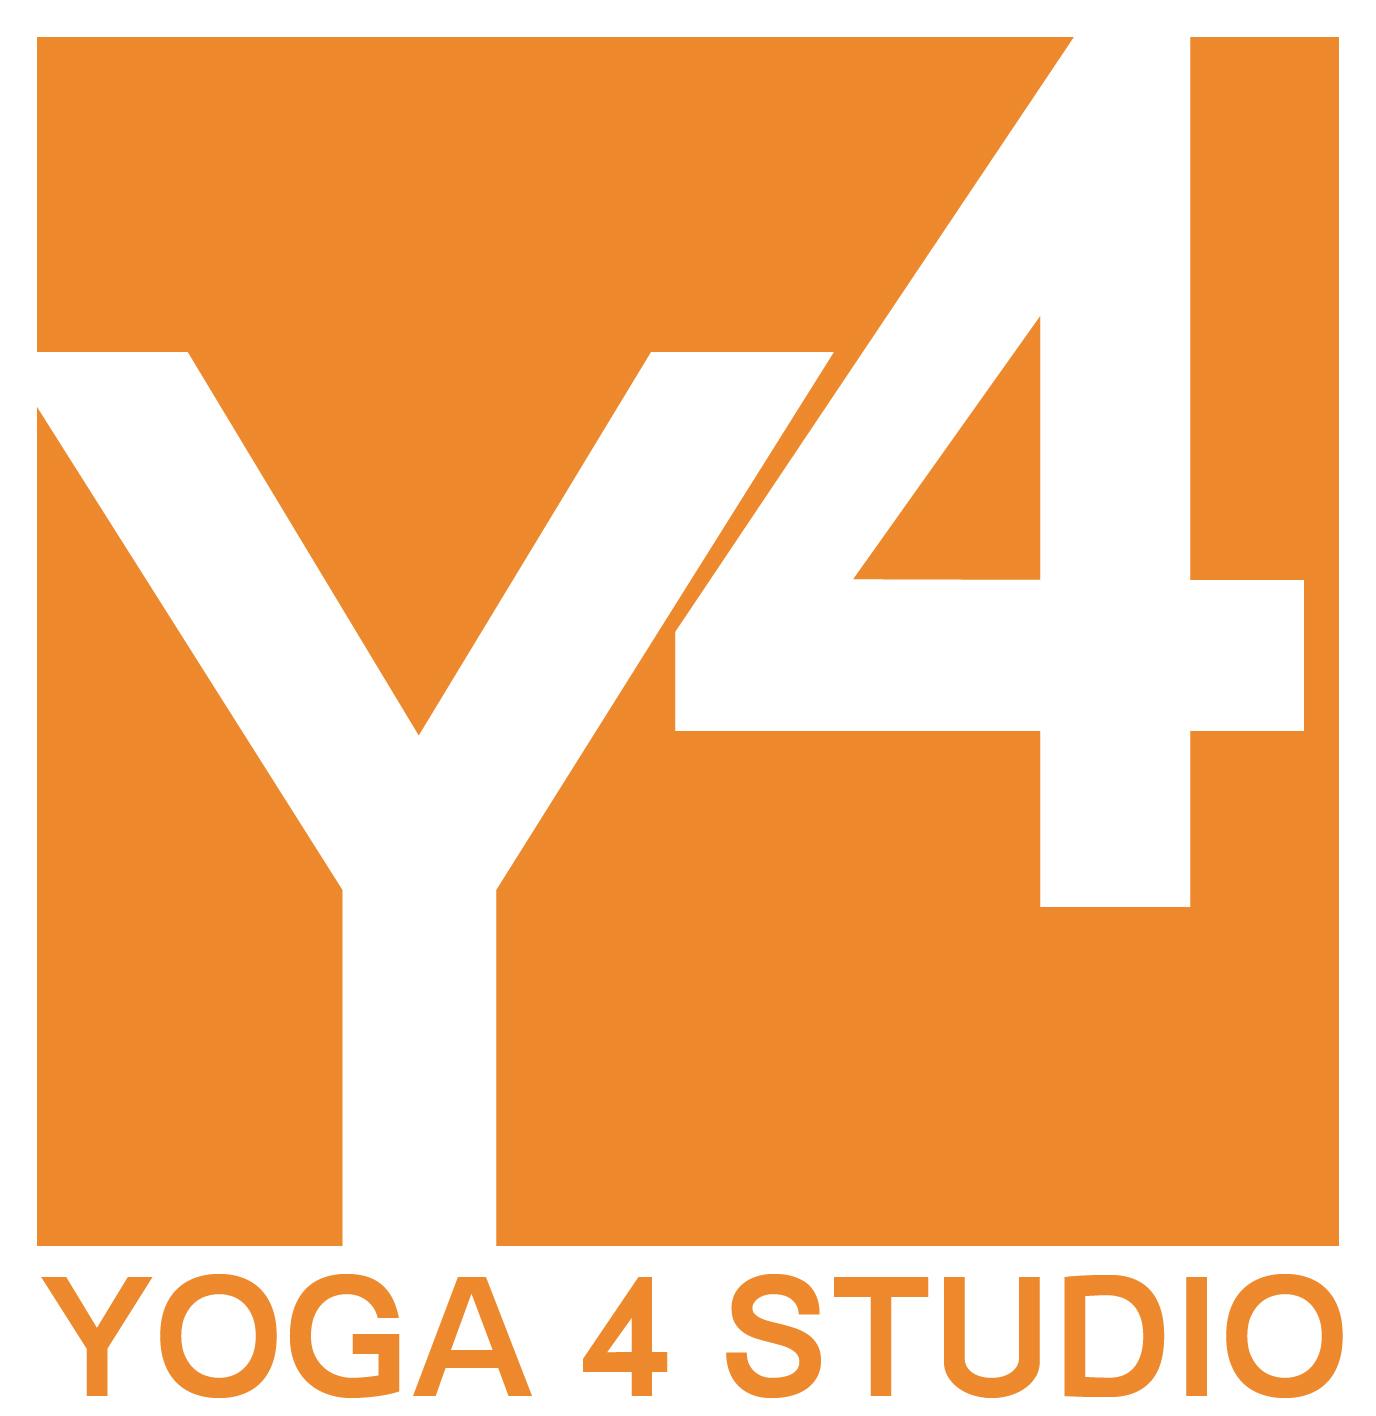 Yoga 4 Studio